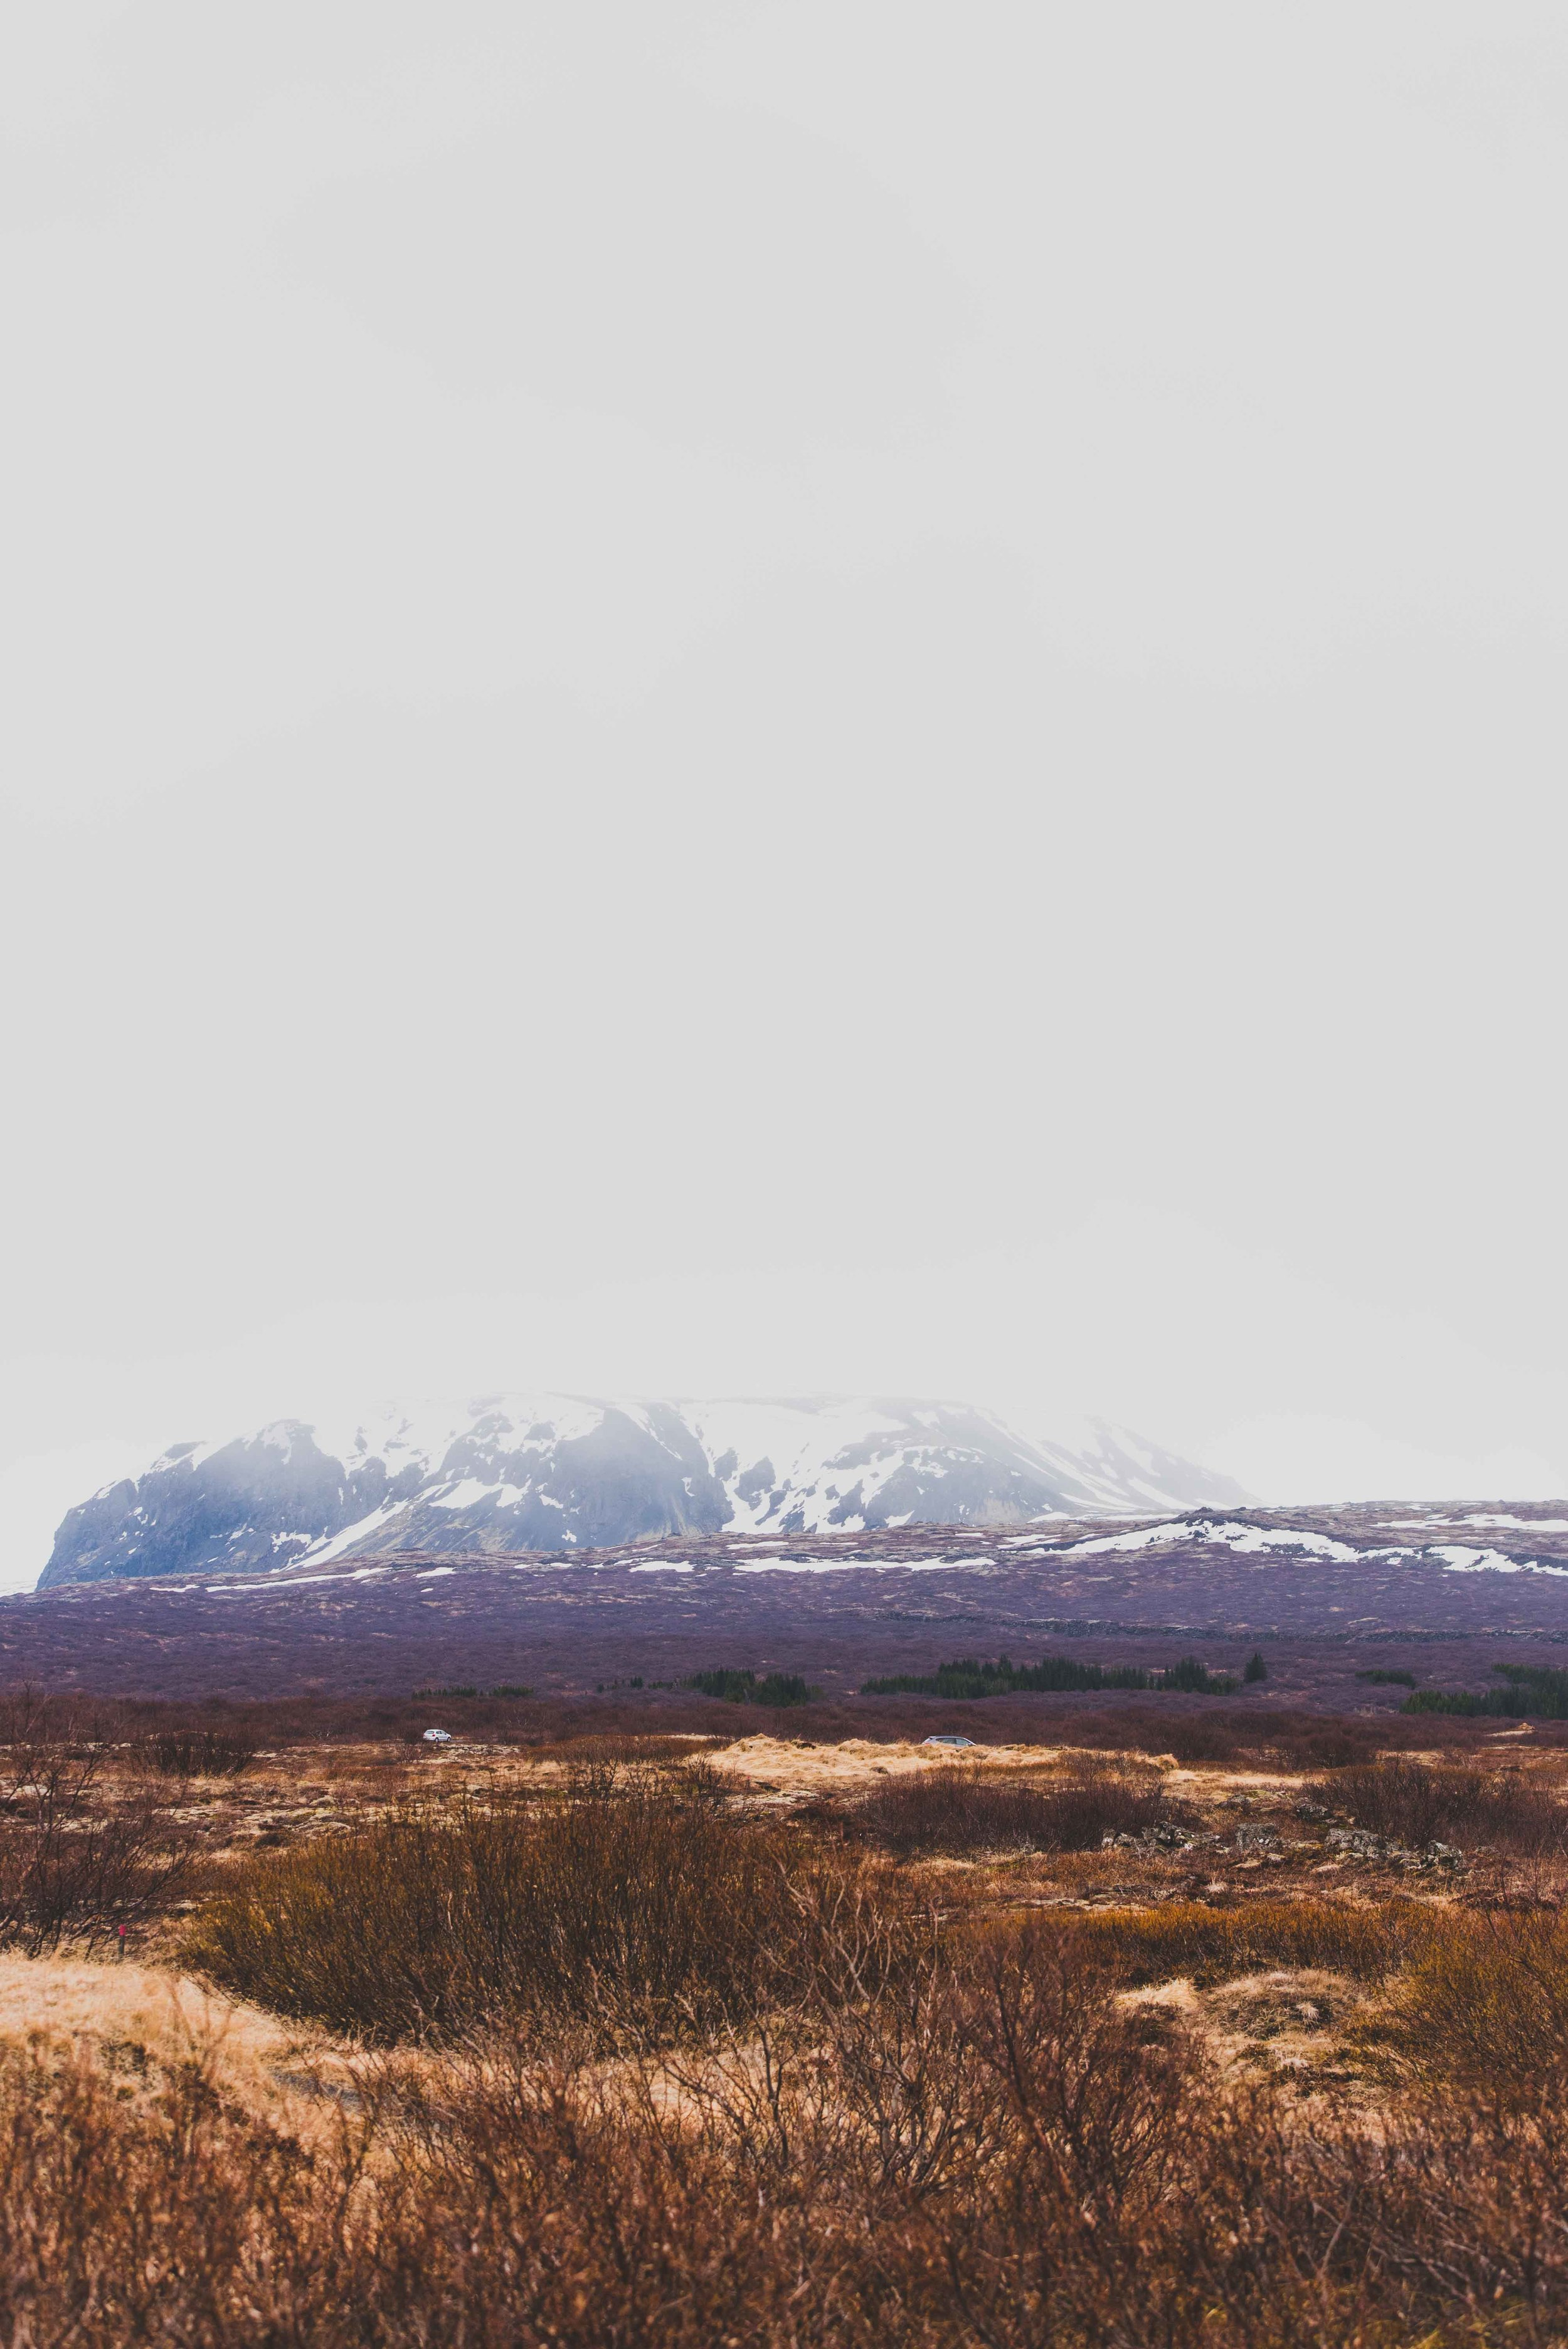 Joe Shutter Iceland Tectonic Plate Fissure Portrait.jpg